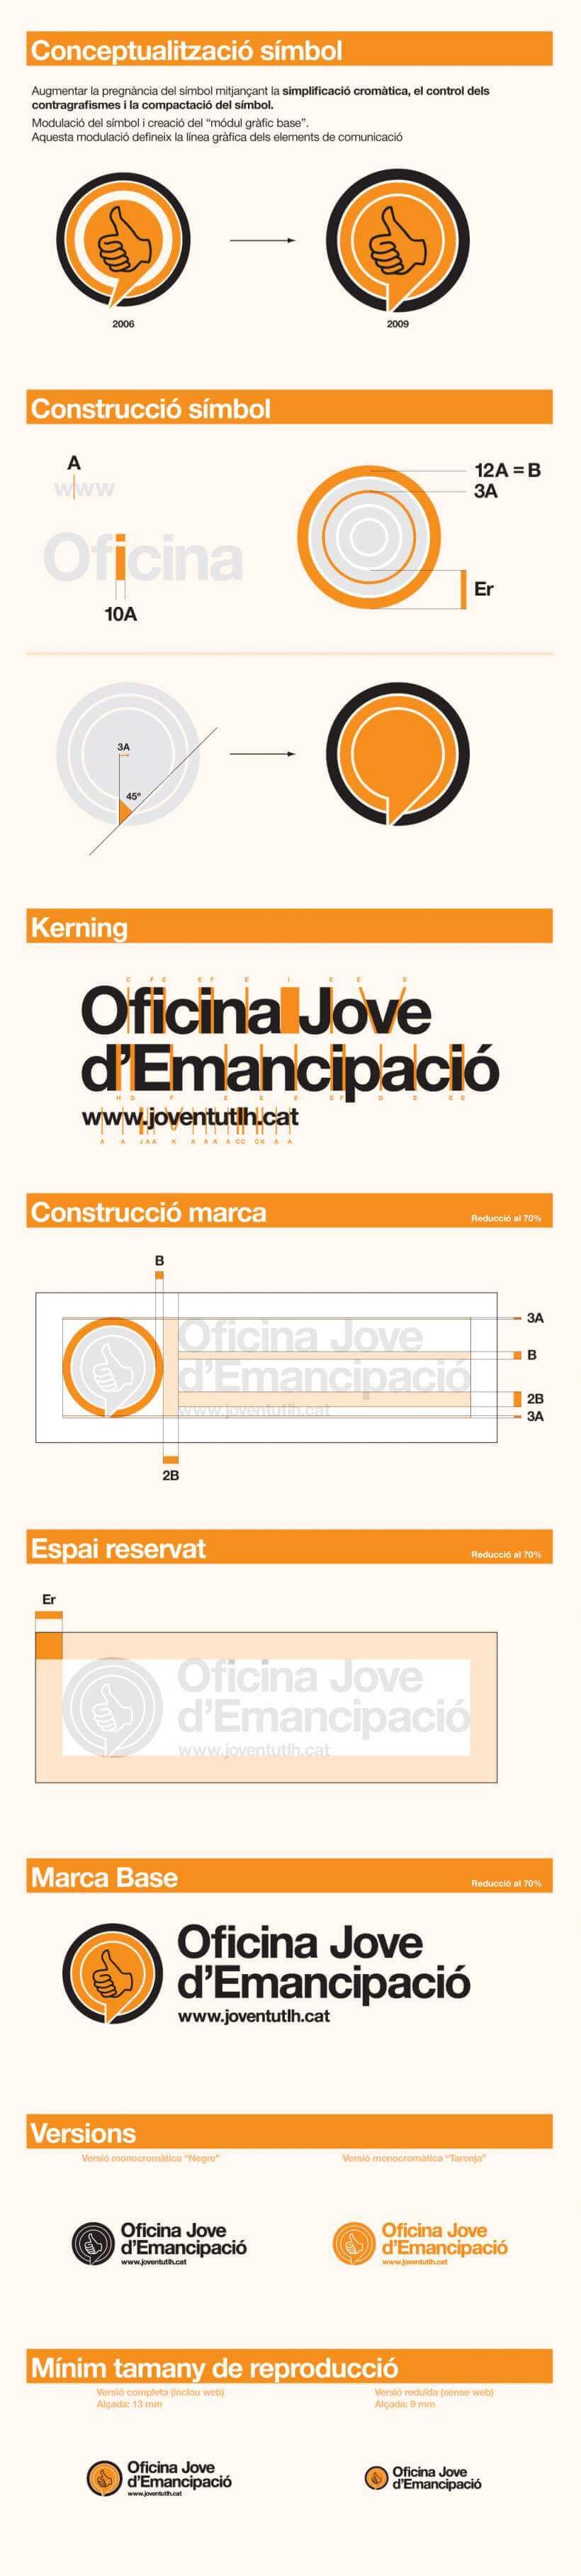 LH-OFICINAJOVE-MARCA-FULL.jpg